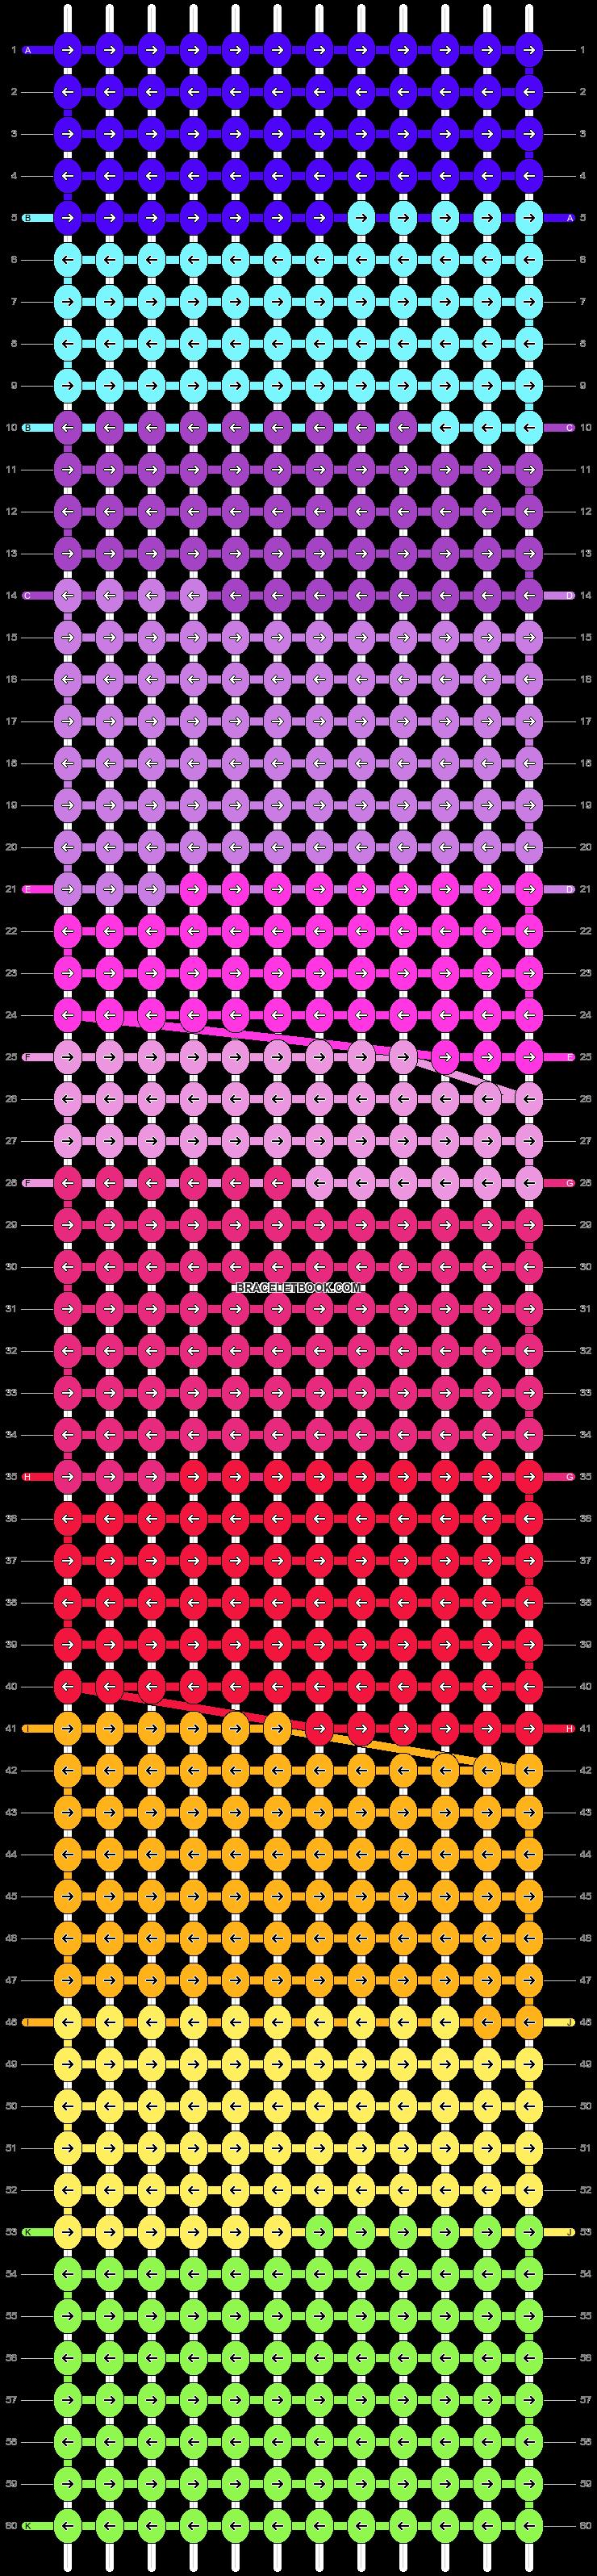 Alpha pattern #14300 pattern